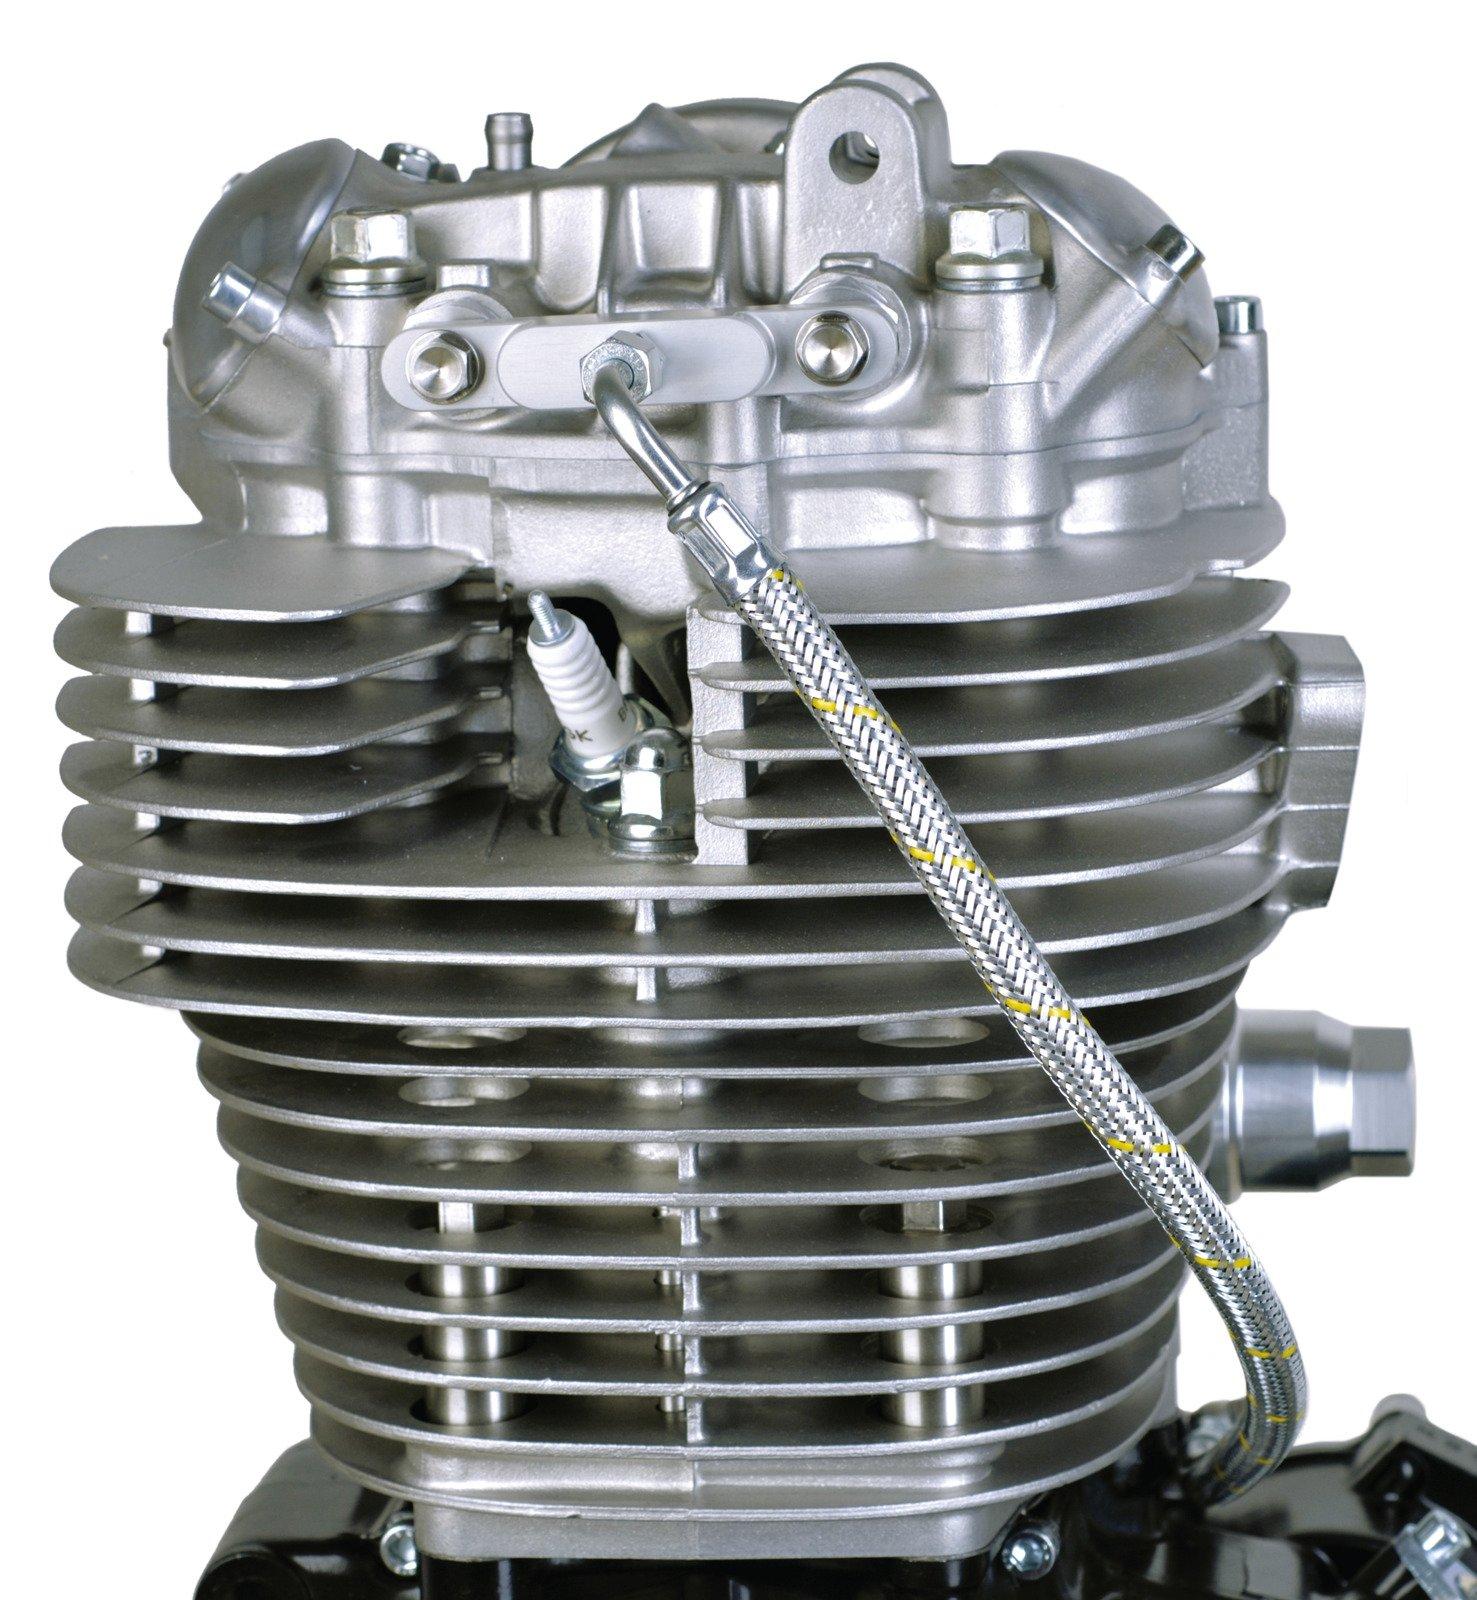 Yamaha HL500 SR400 SR500 TT500 XT500 Twin Feed Oil Line Kit - Steel Braided Silver Classic Style w/ CNC Milled Aluminum Block 19-003